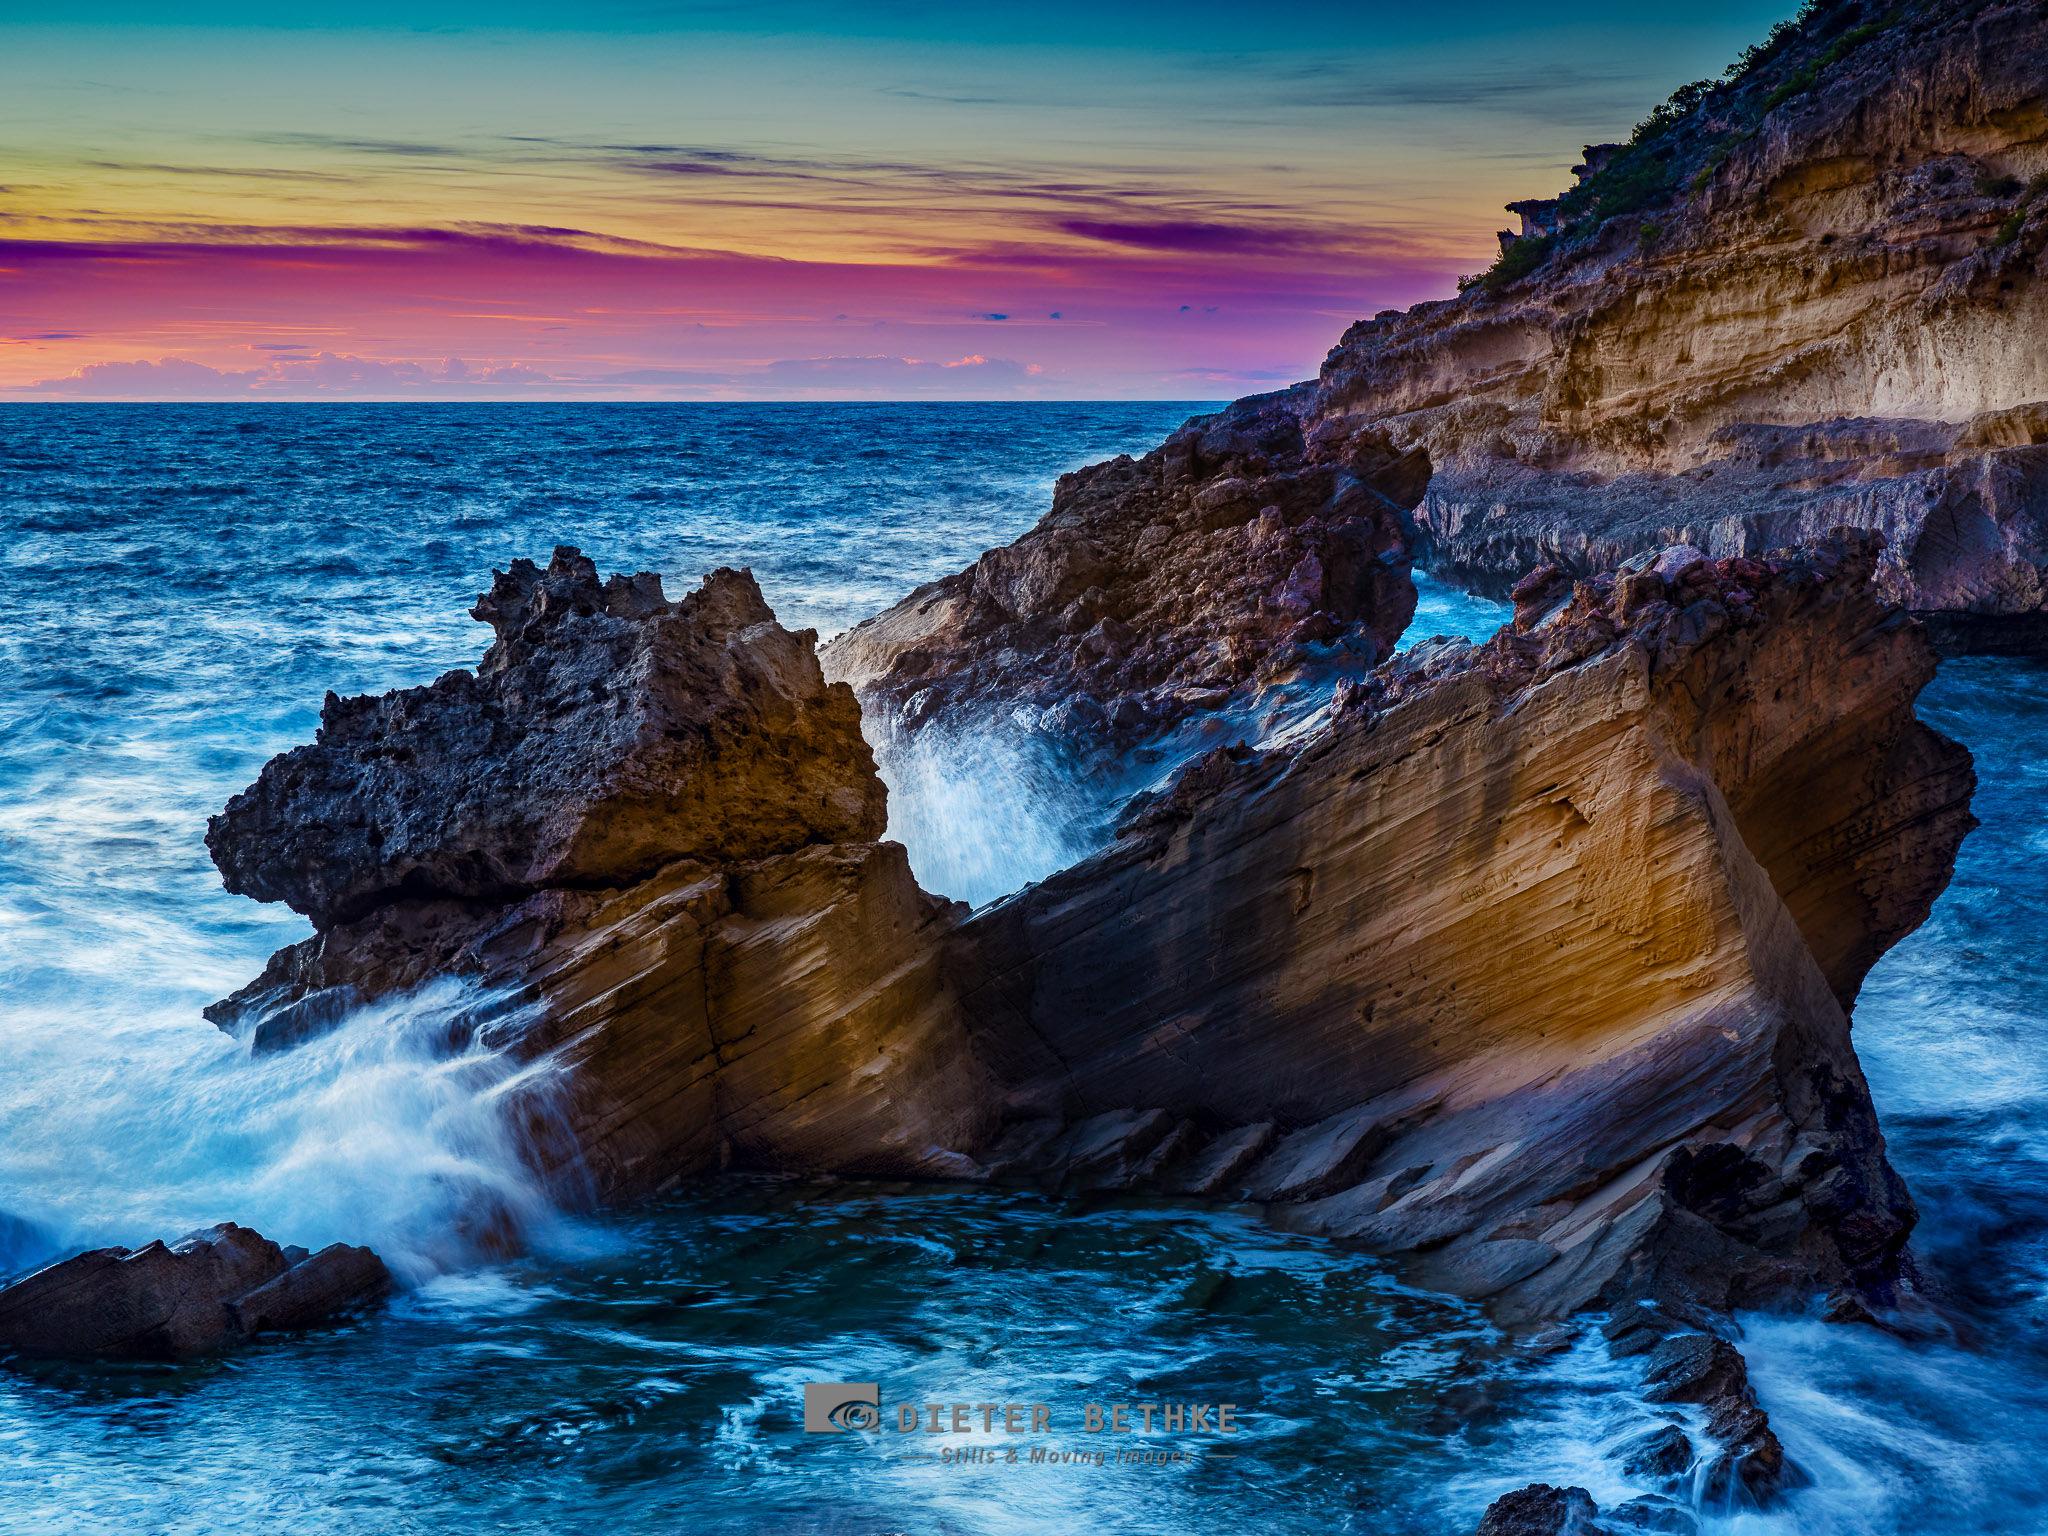 Crashing Waves at El Toro